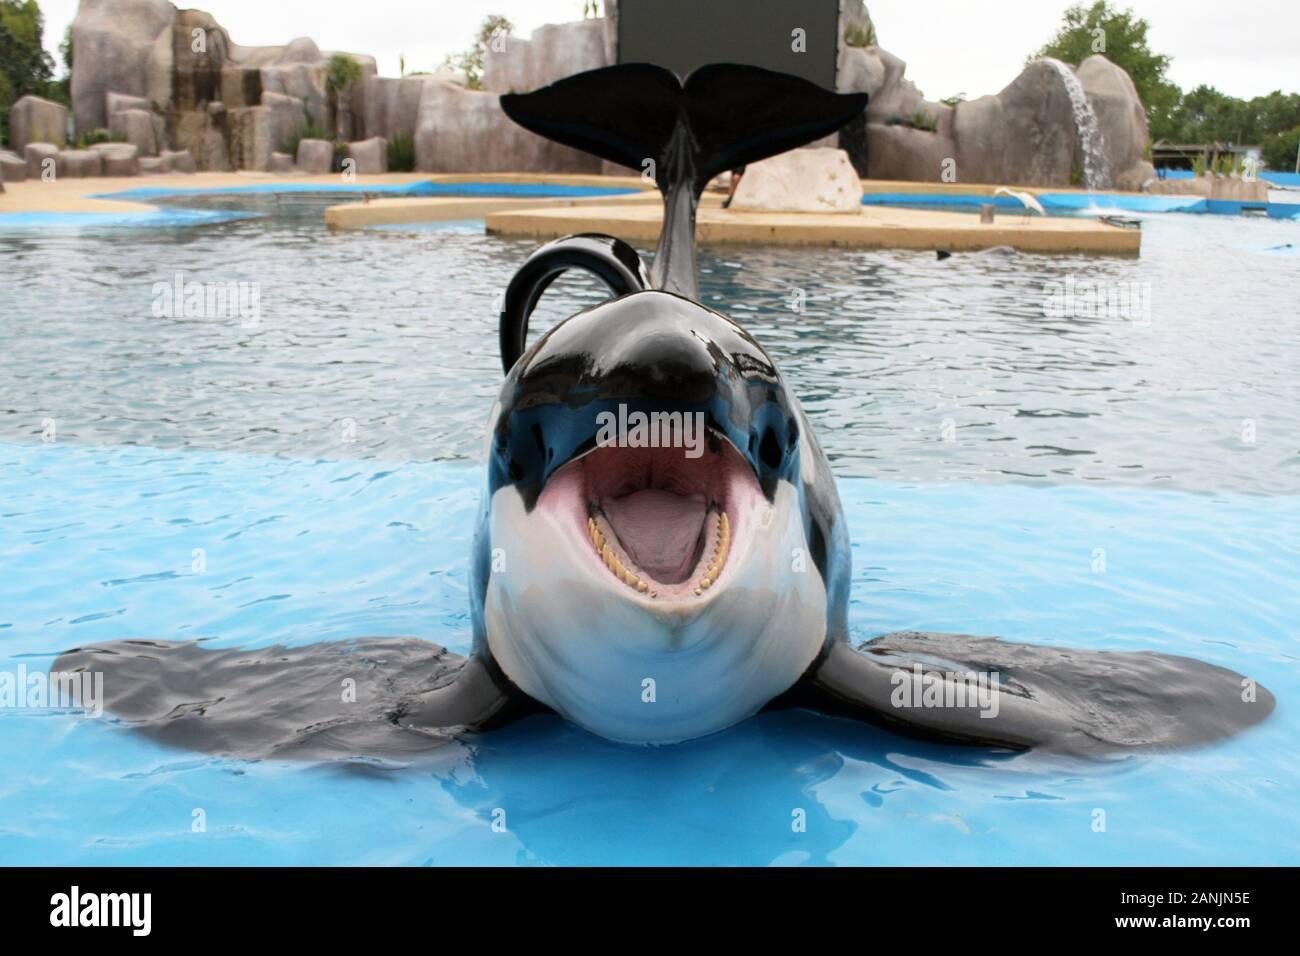 Kshamenk, the Orca of Mundo Marino smiles for my camera. Stock Photo